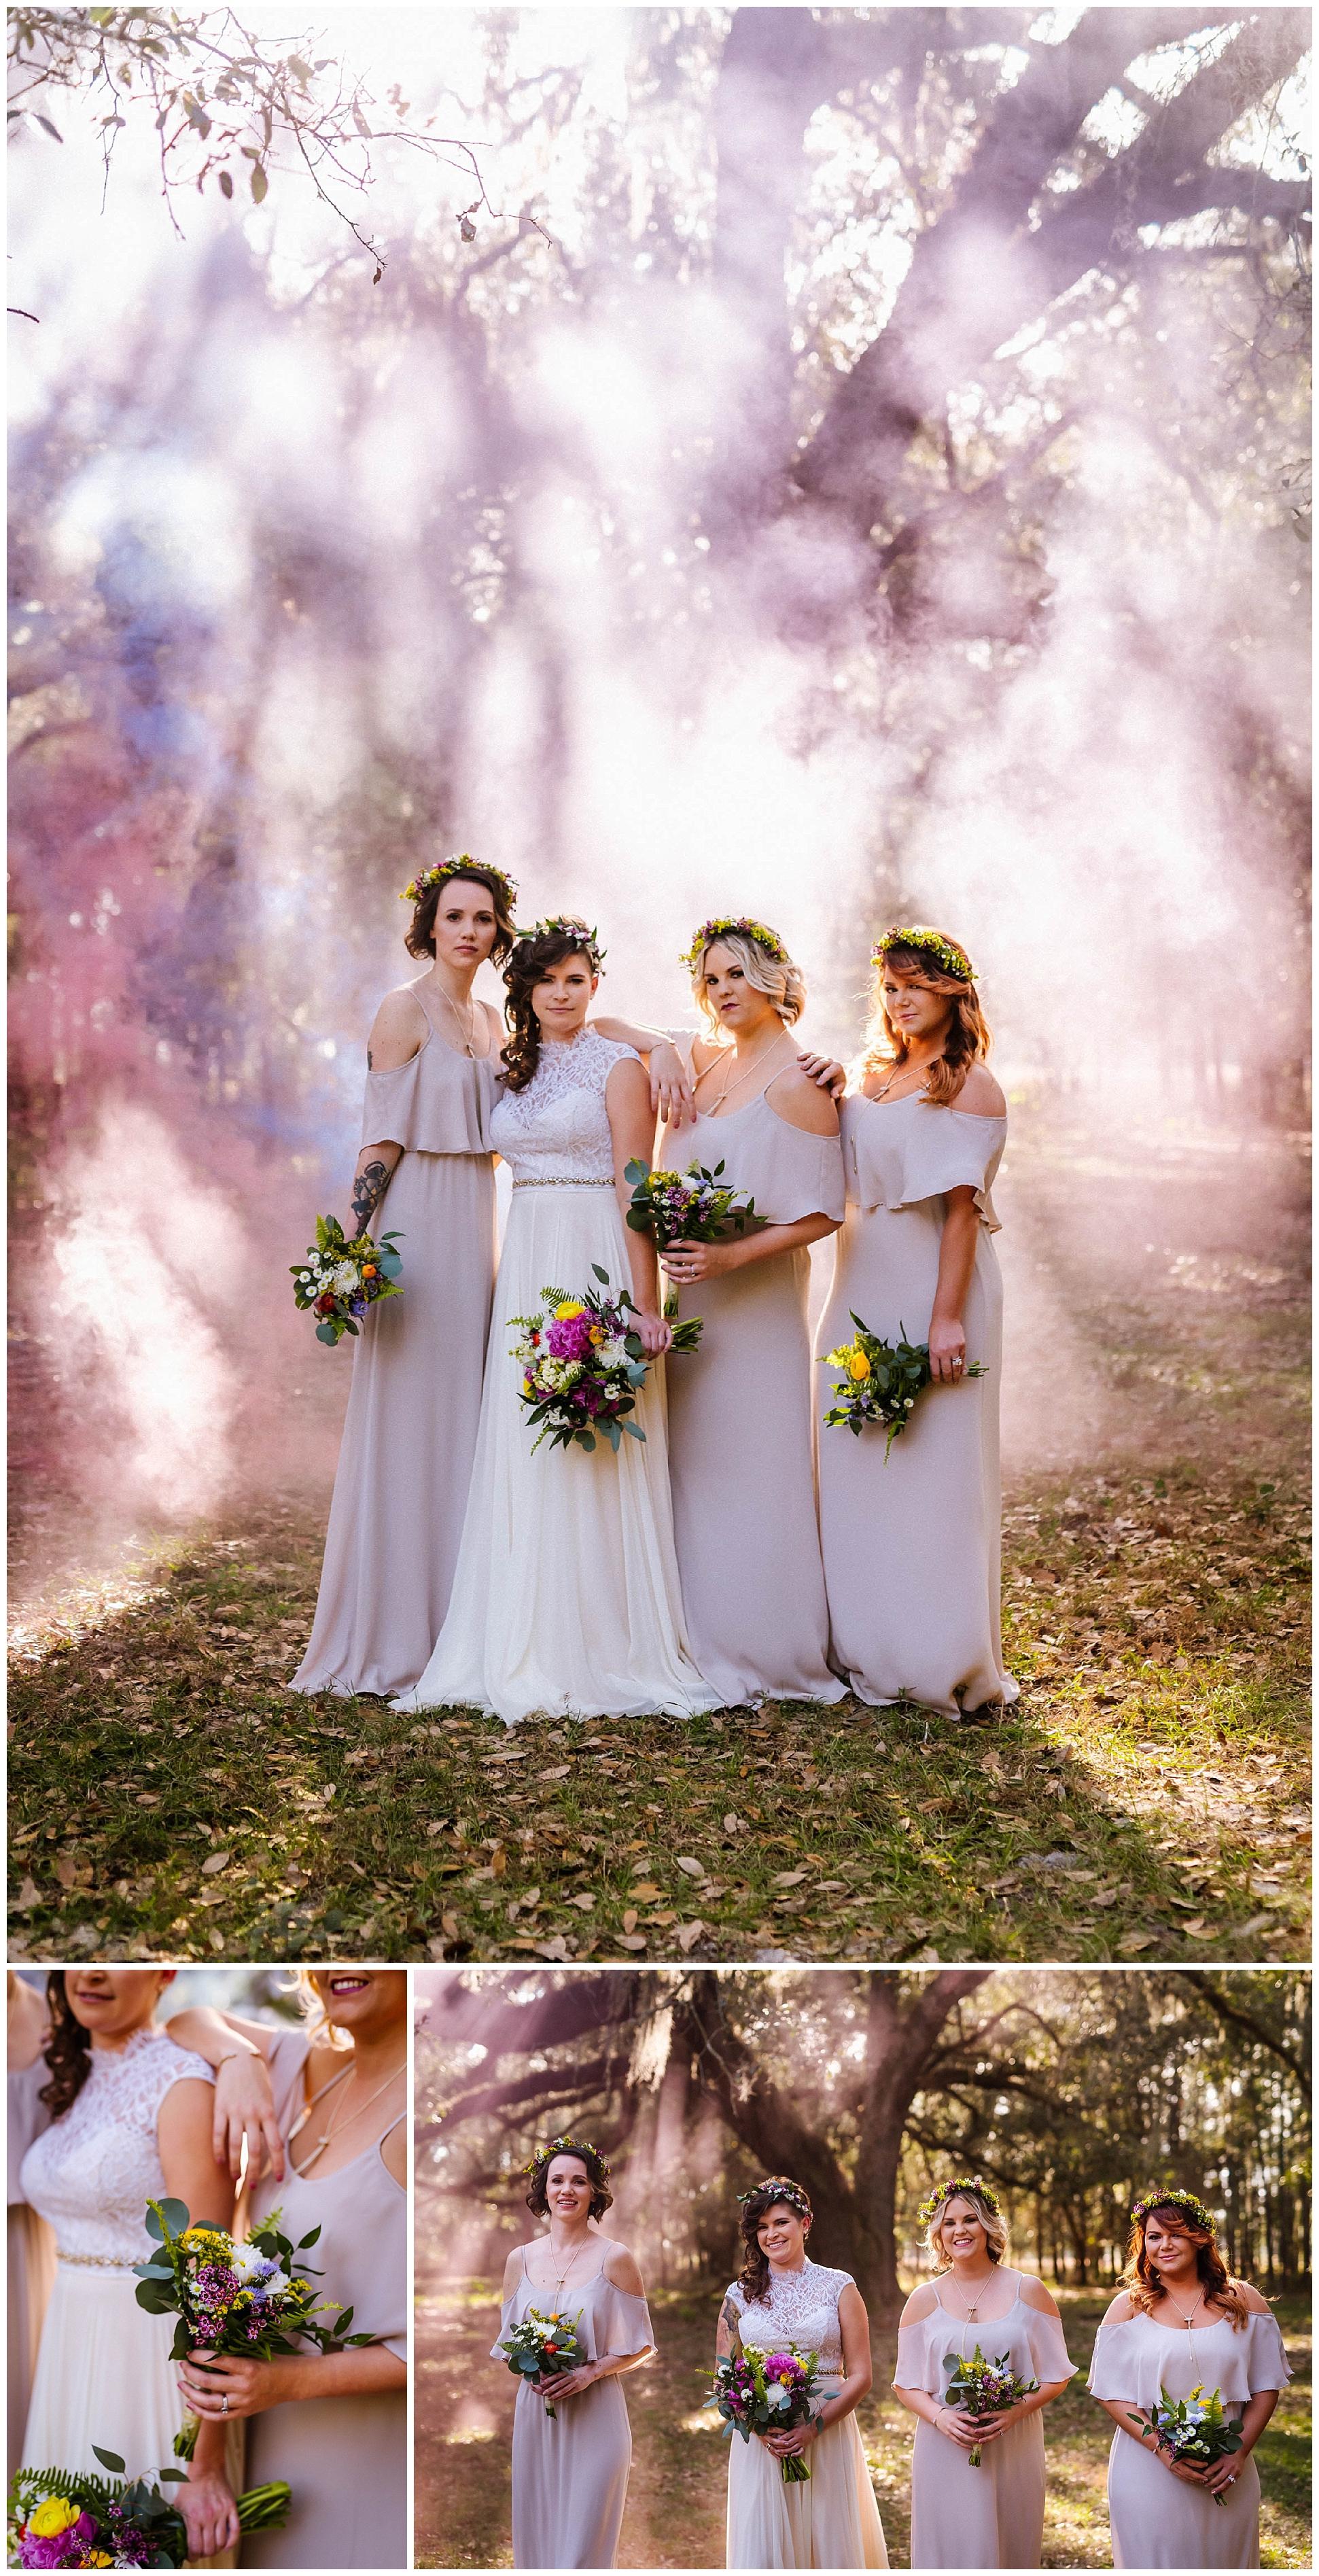 magical-outdoor-florida-wedding-smoke-bombs-flowers-crown-beard_0023.jpg